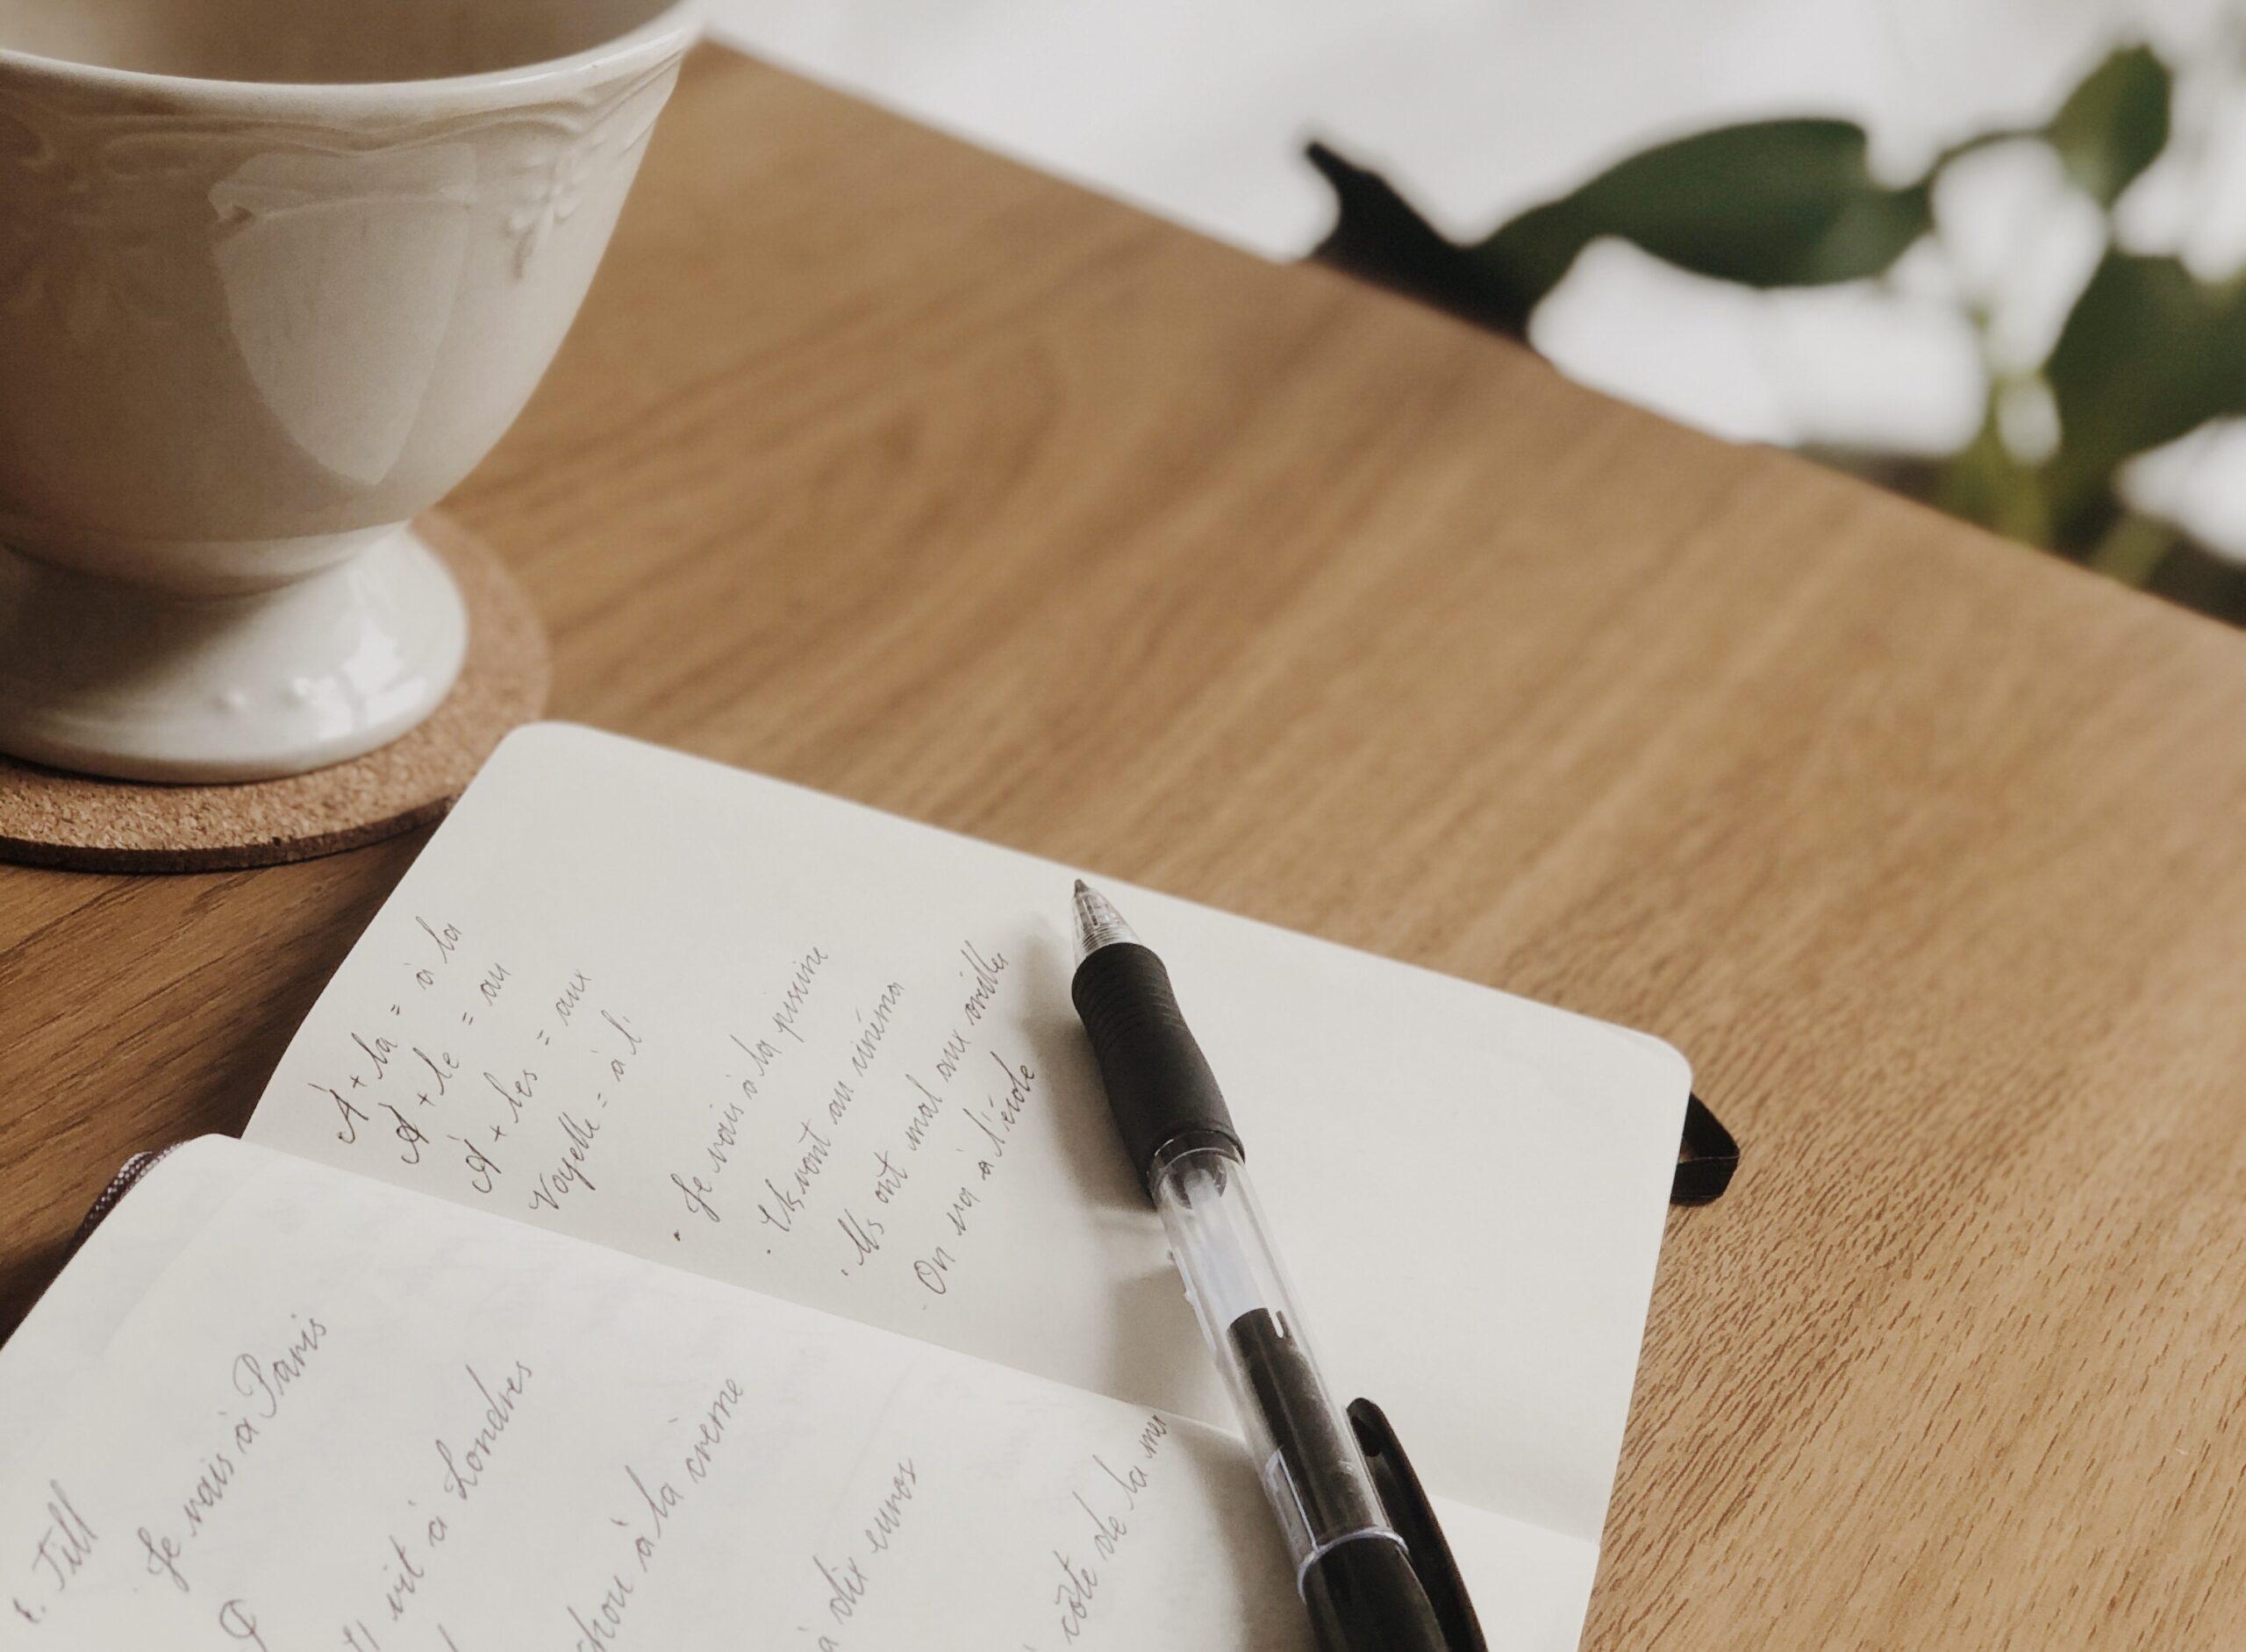 Top 4 Best 0.5 Gel Pens – Fine Tip & Black Ink